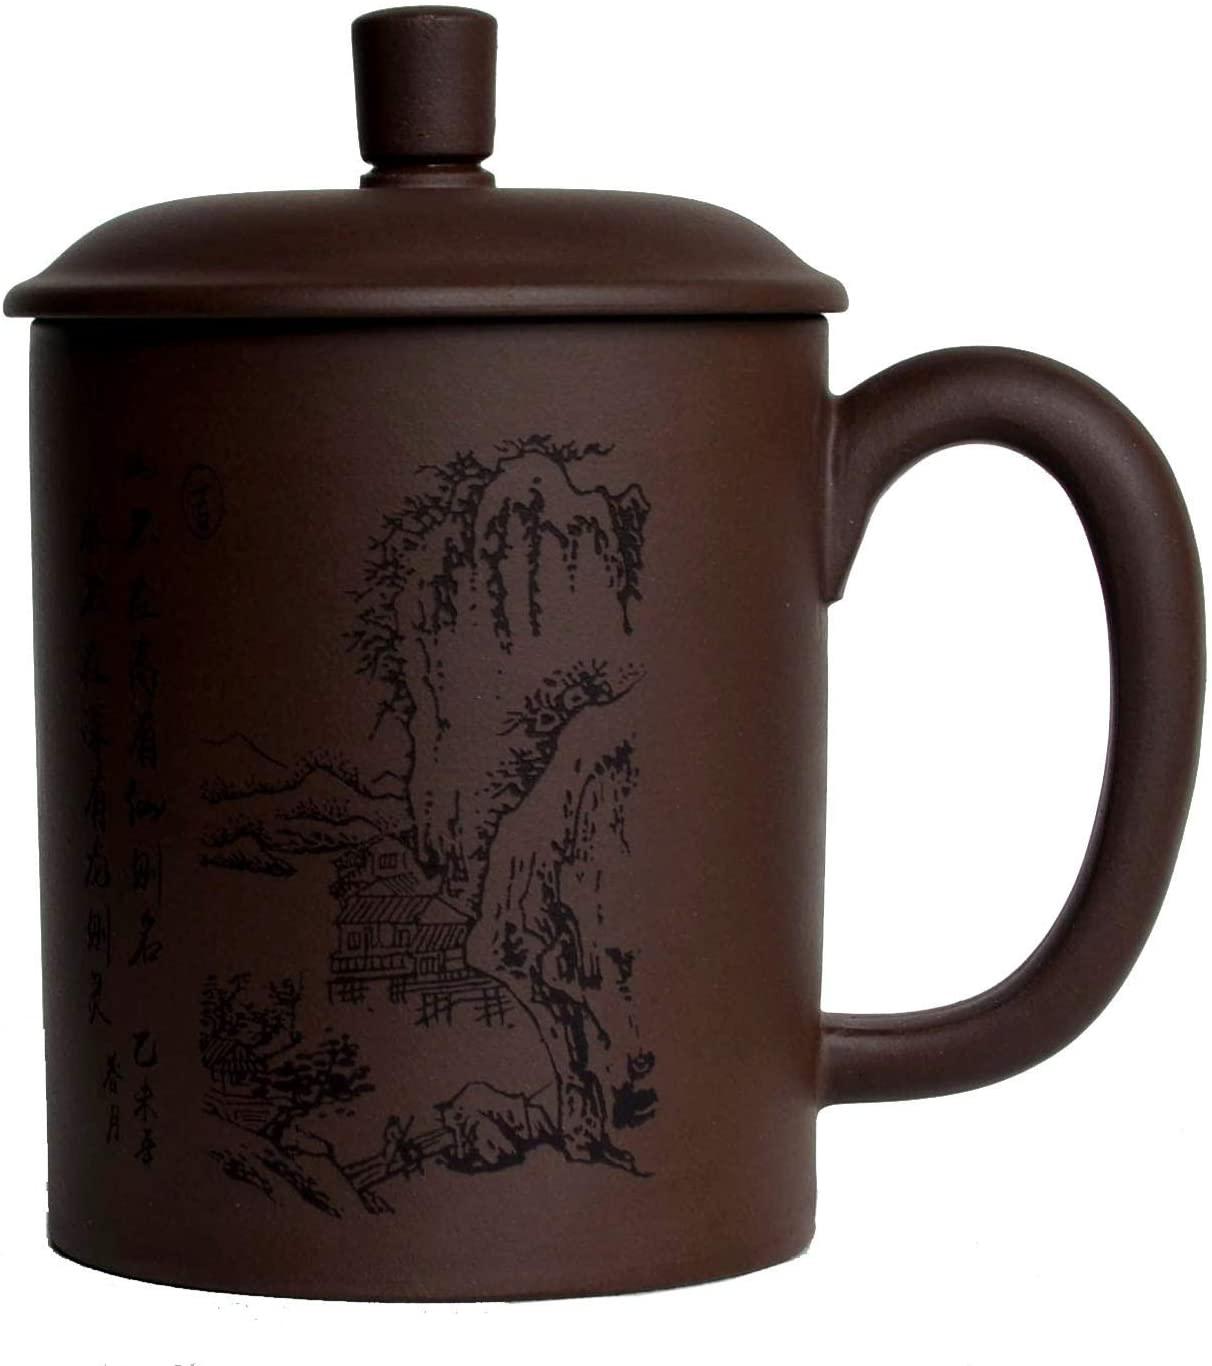 Zisha Teacups 500ml Chinese Yixing Purple Clay Tea Cups Handle Lip Coffe Tea Mugs Landscapes Home Office